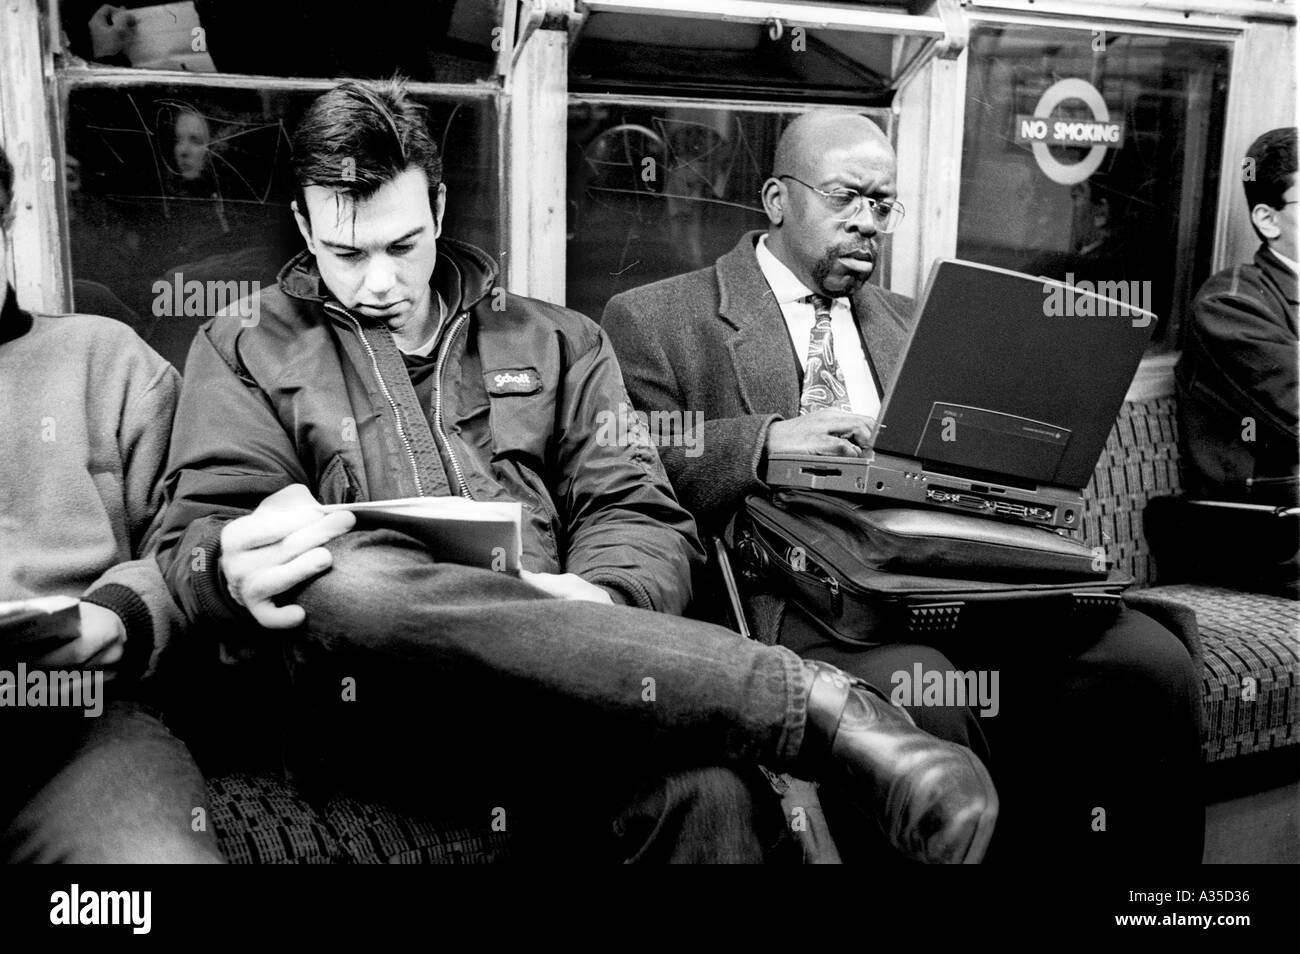 Man doing his Homework on the tube London England Britain UK Stock Photo